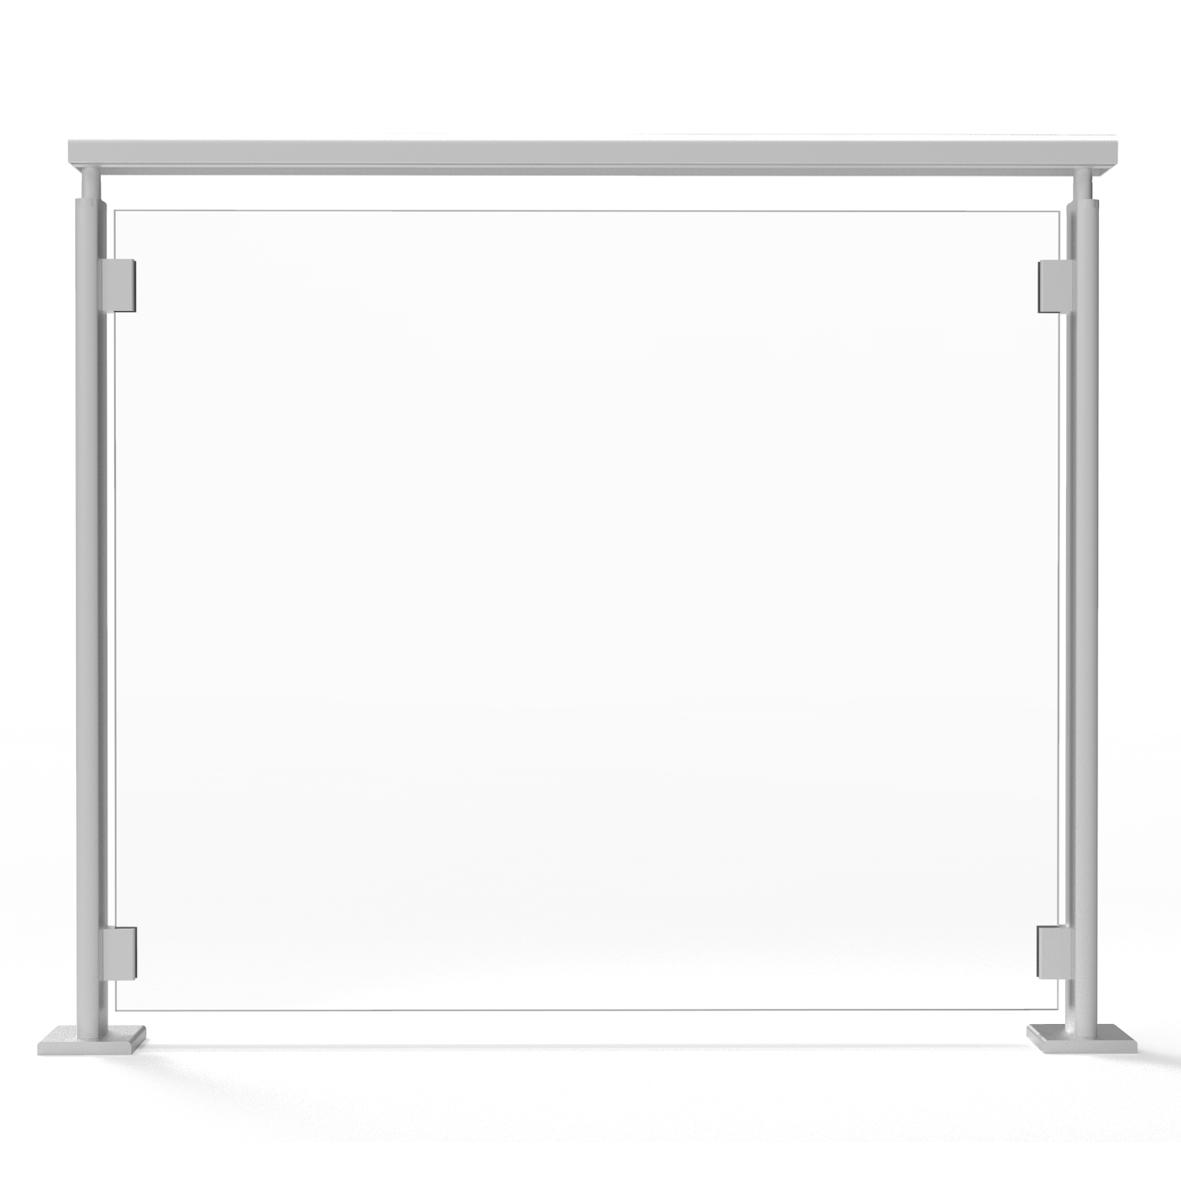 https://www.allpaint.it/wp-content/uploads/2021/07/ringhiere-alluminio-clamp-allpaint.jpg